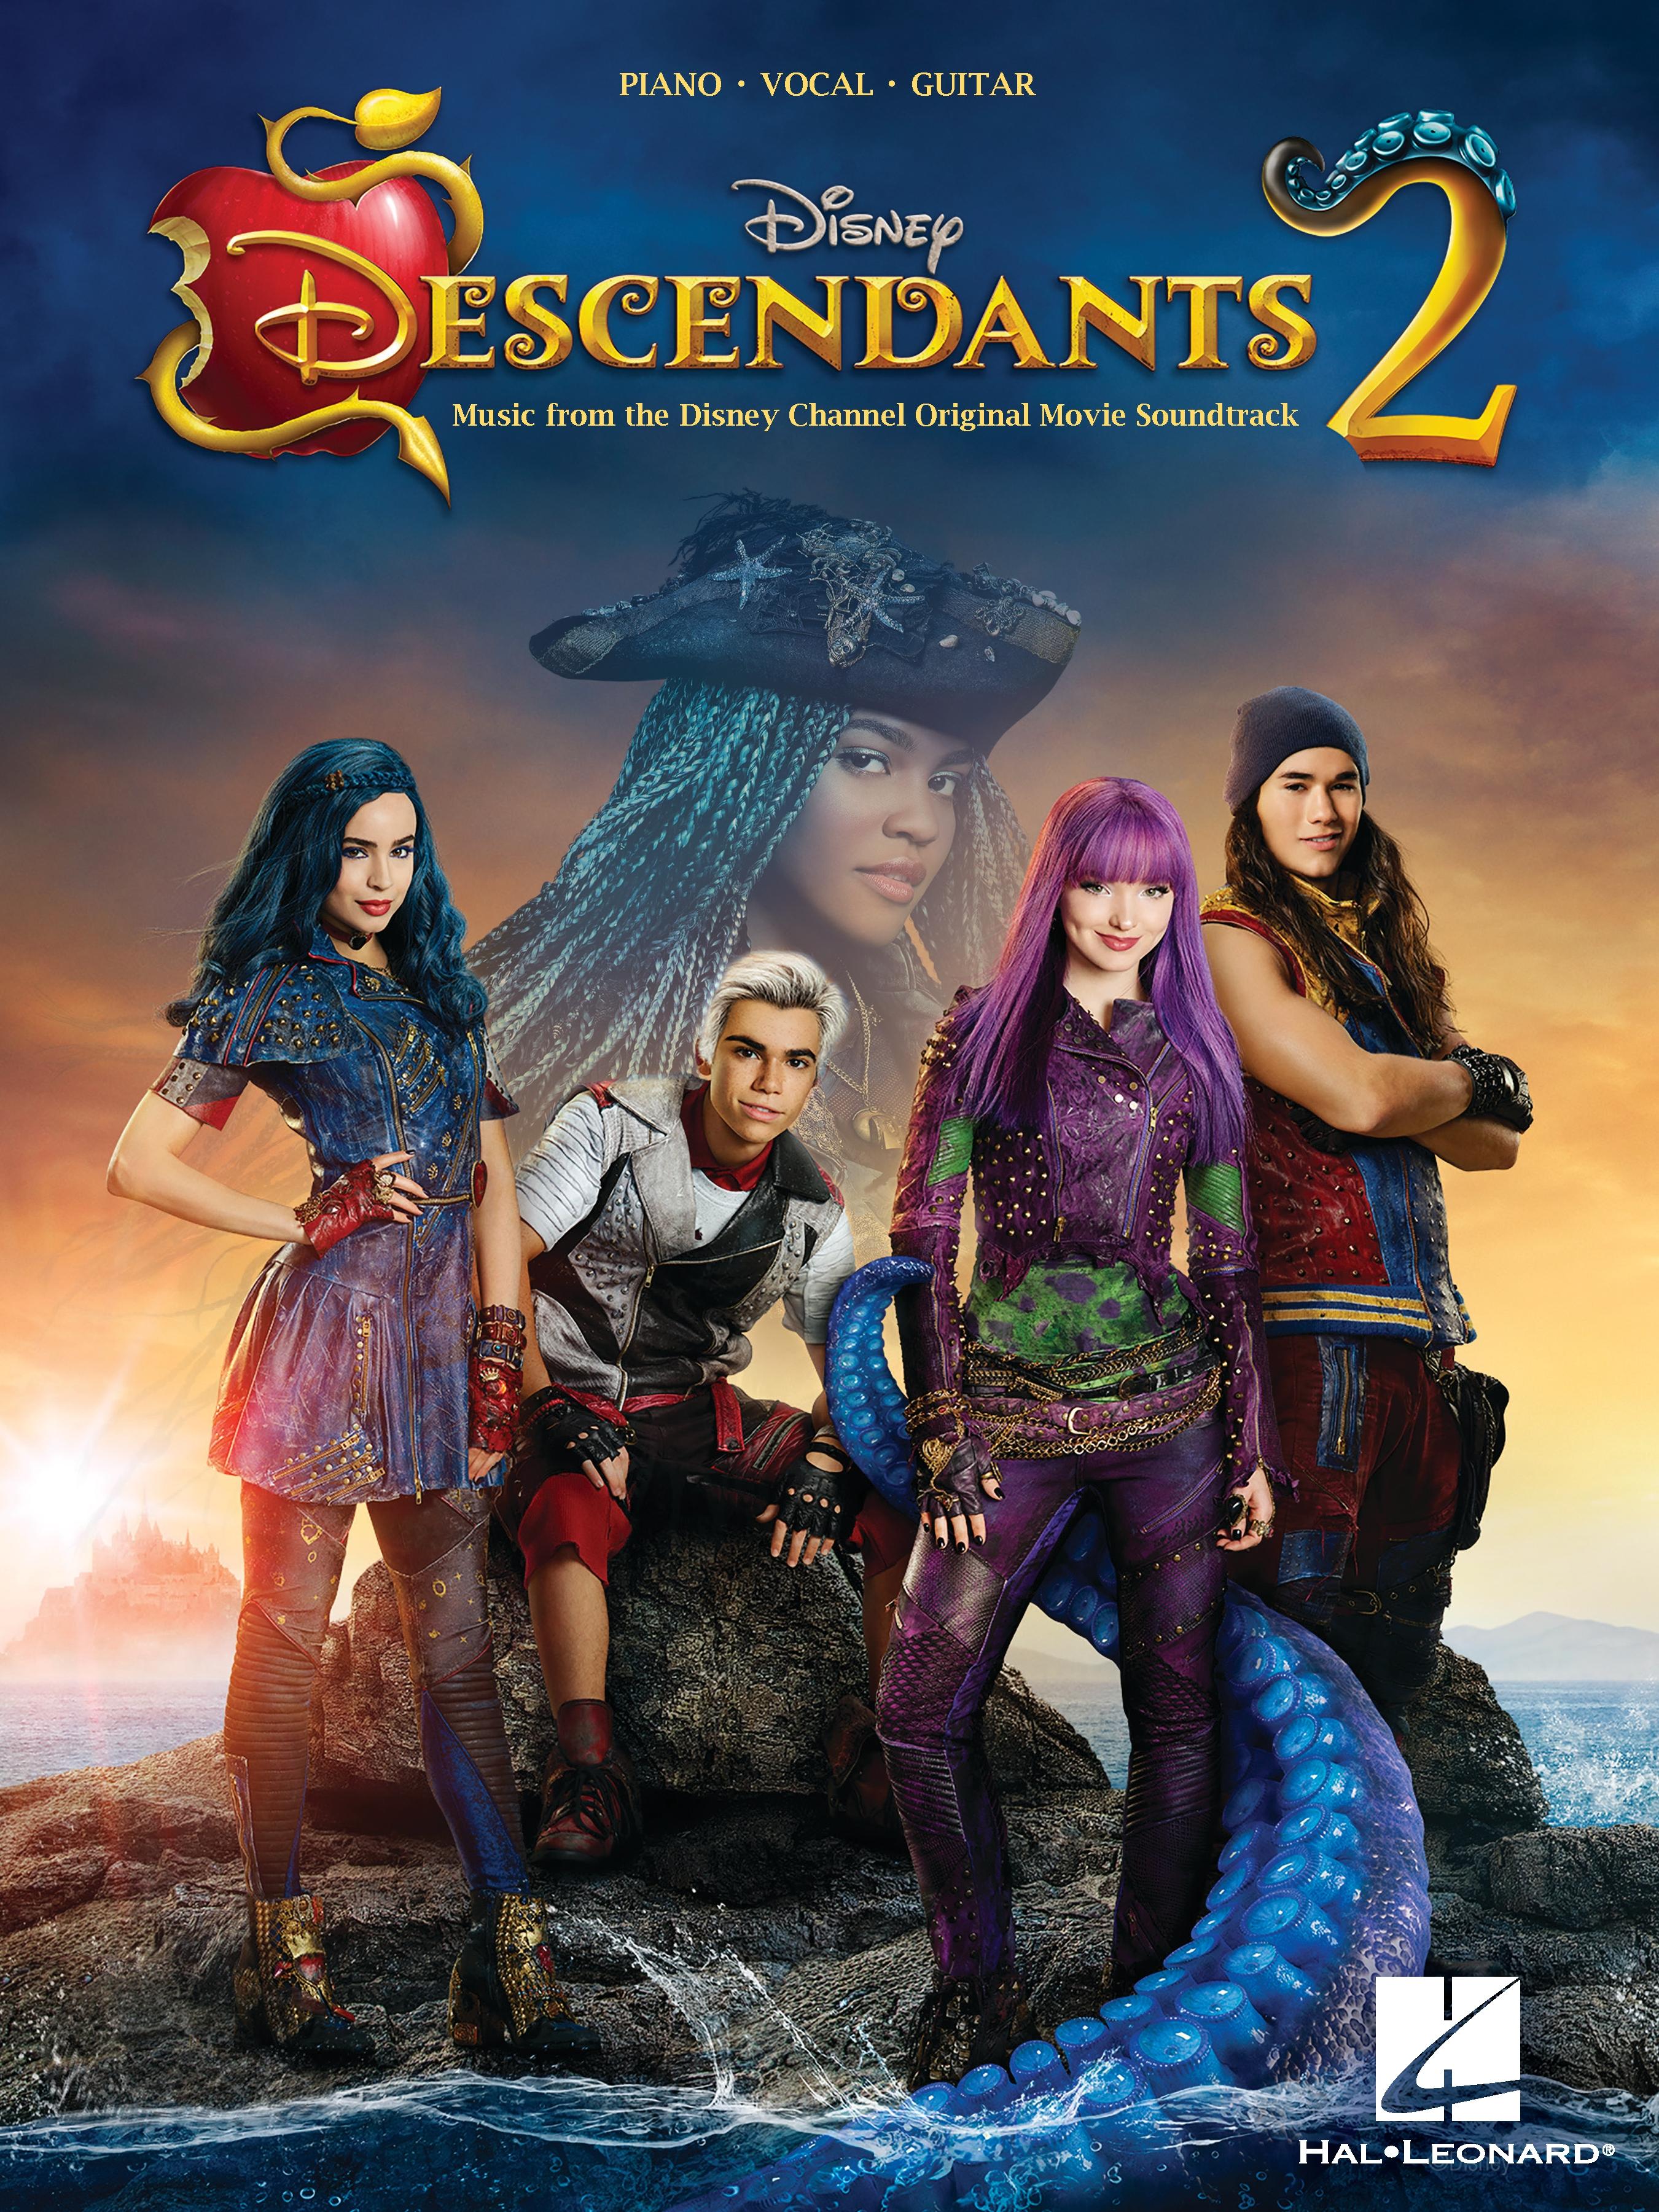 Disney's Descendants 2